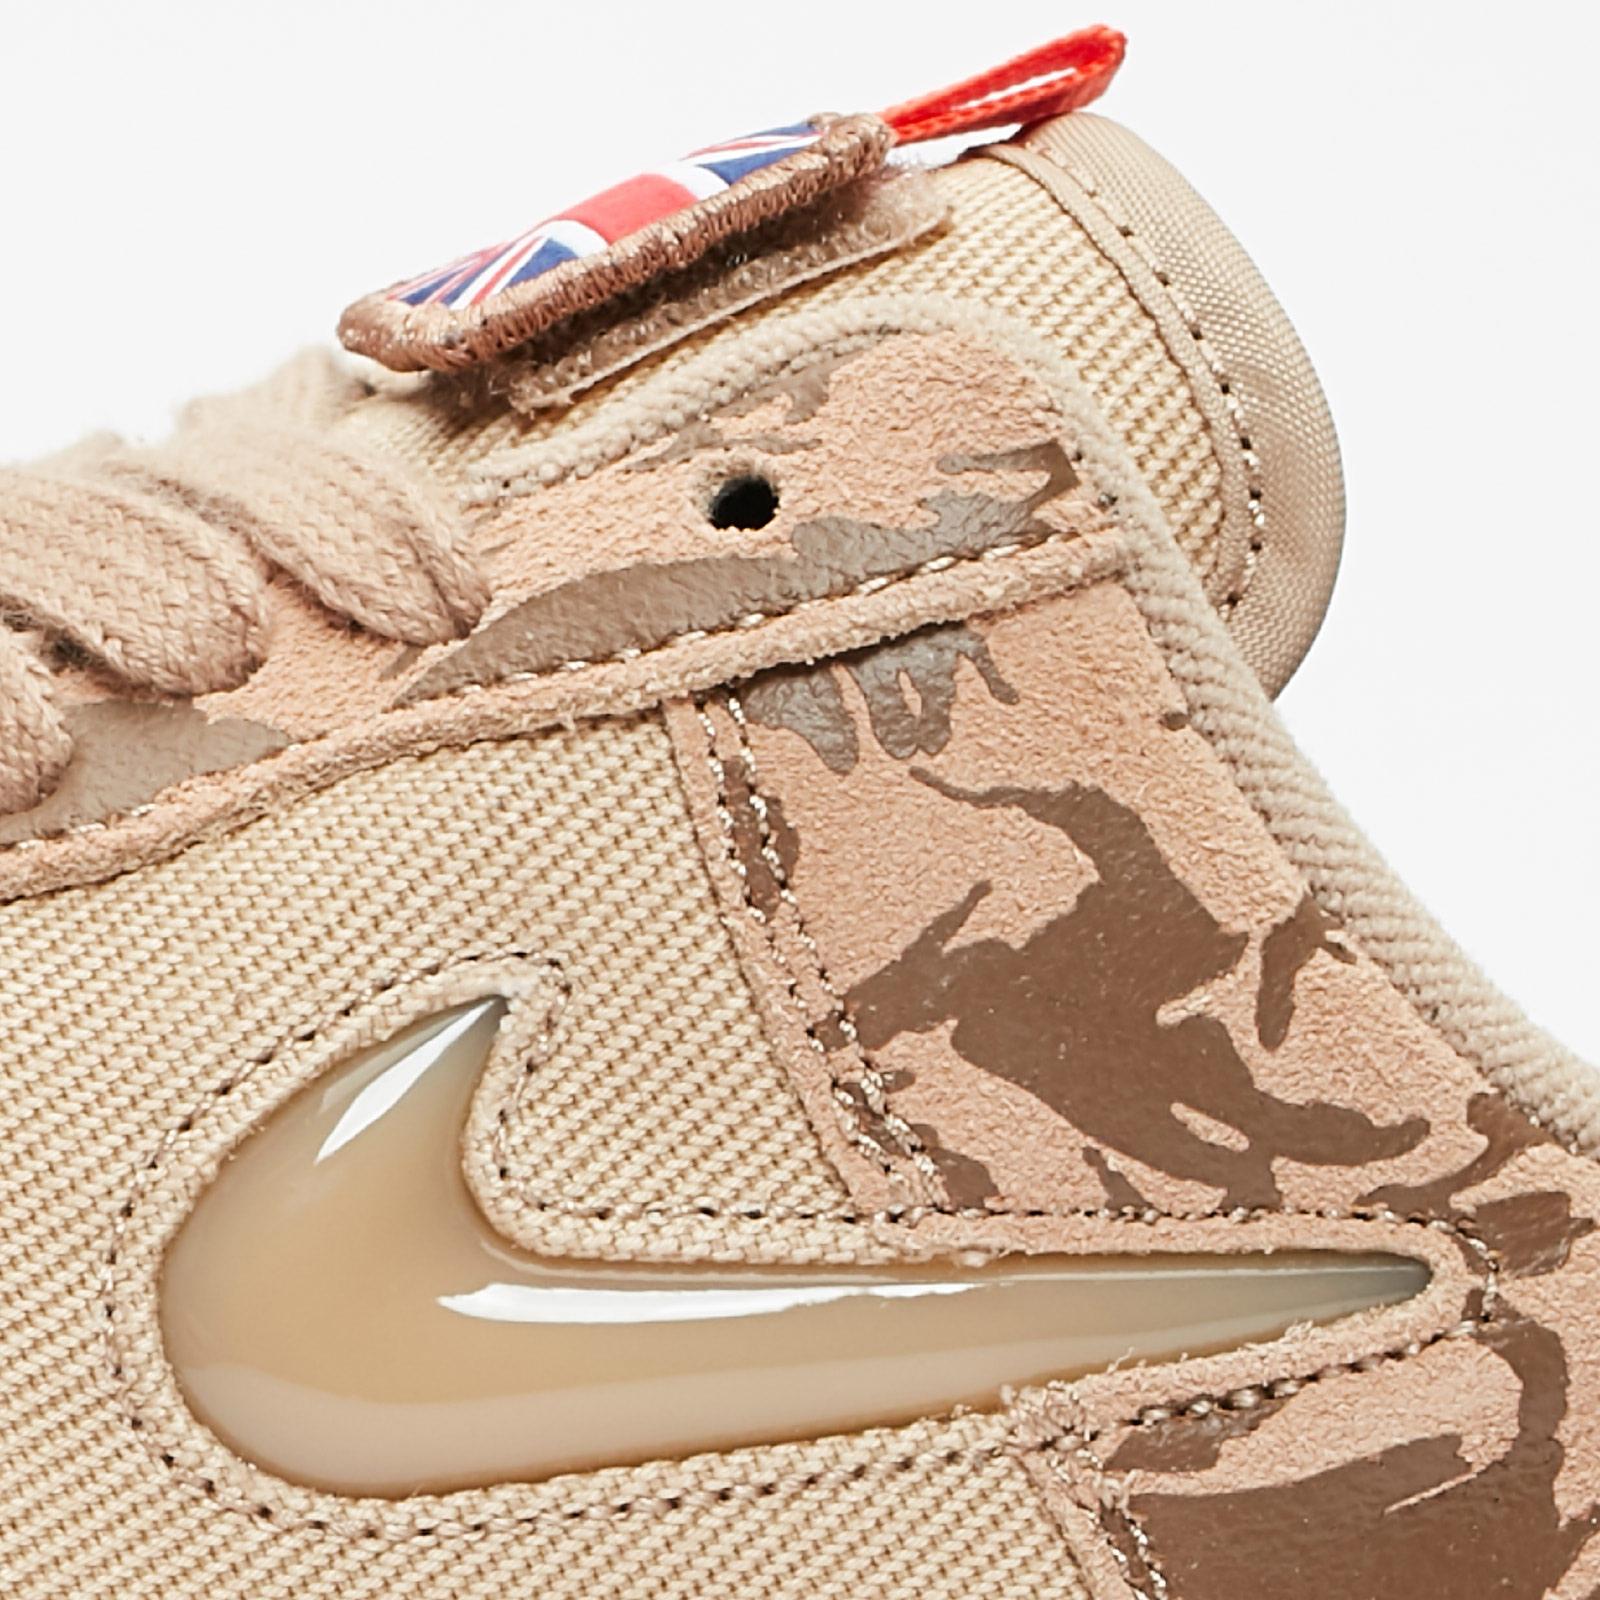 Nike Air Force 1s Jewel Low Country Camo UK AV2585 200